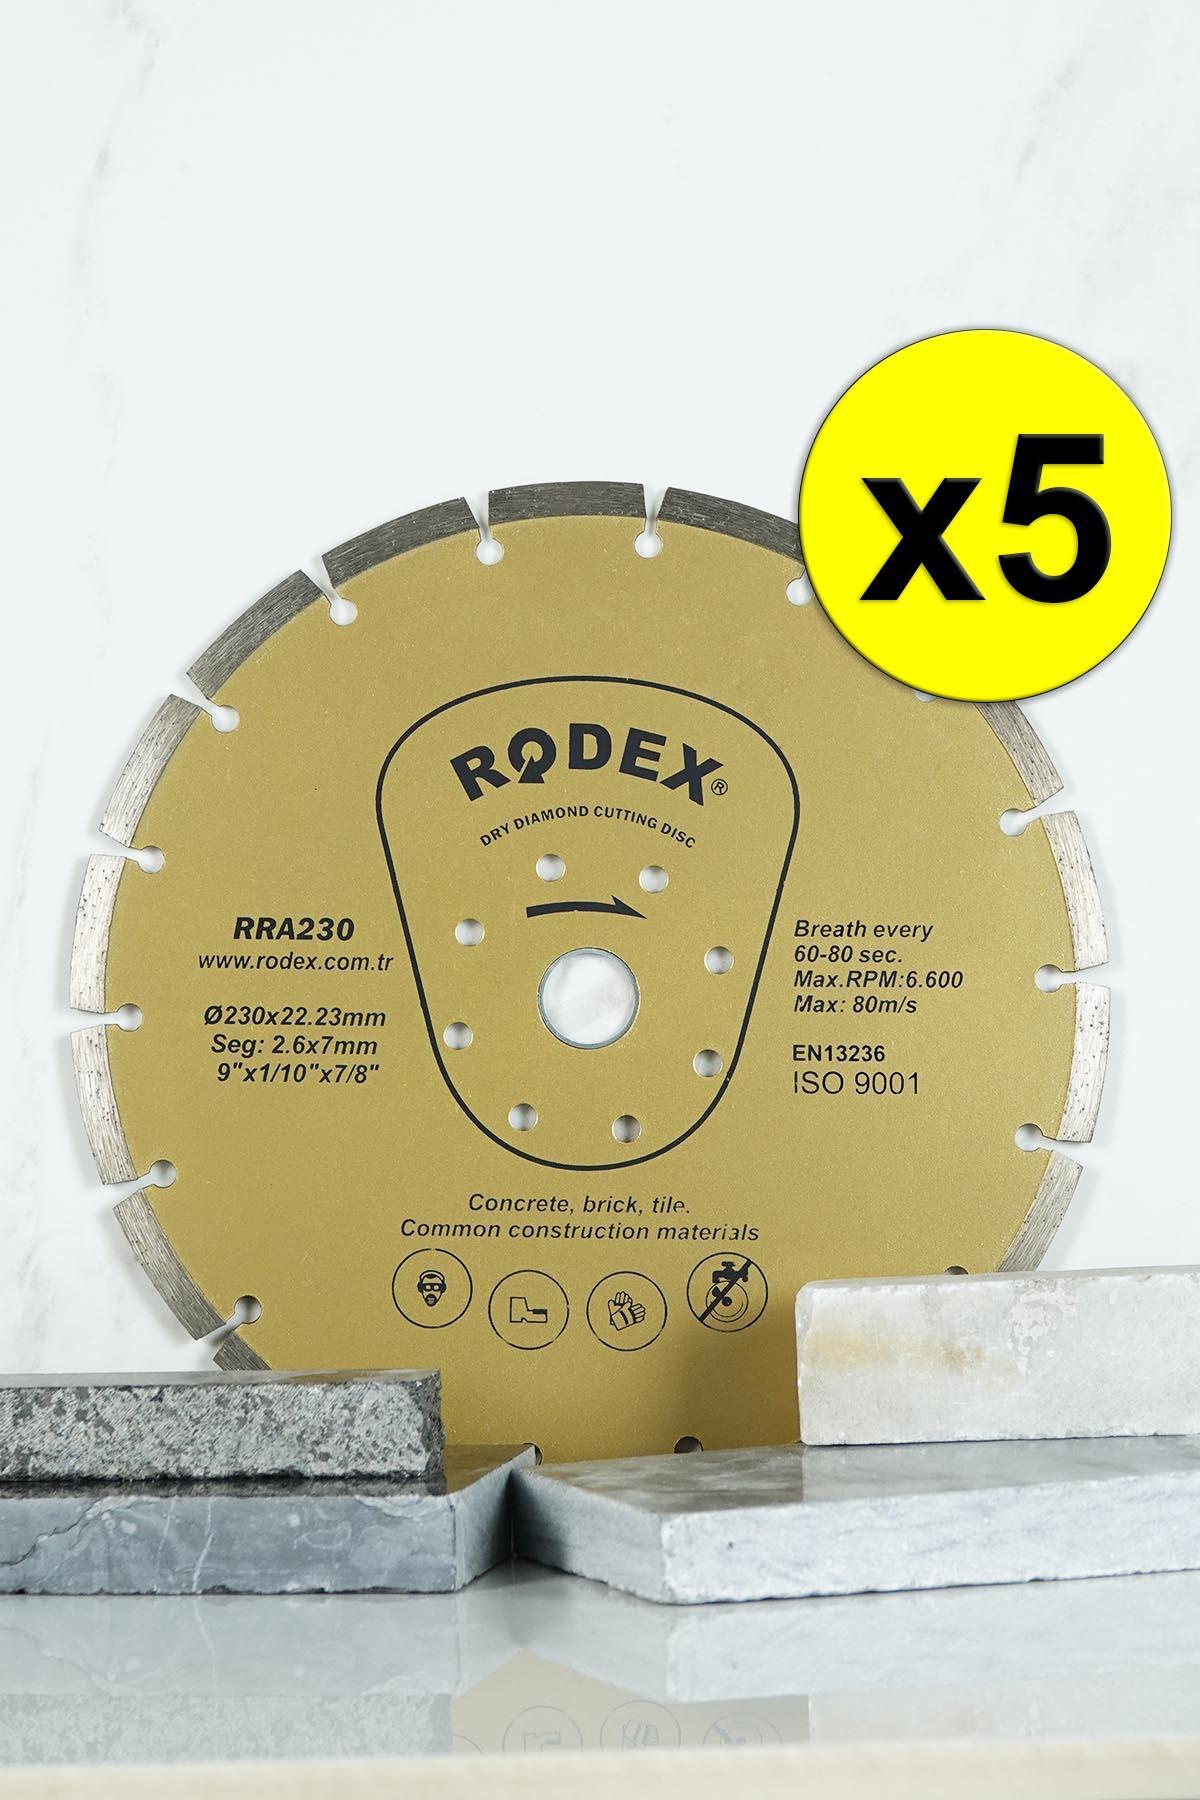 Rodex RRA230 Socketed Type Diamond Cutting Disc for Bricks, Granite, Marble 230mm 5 Pcs